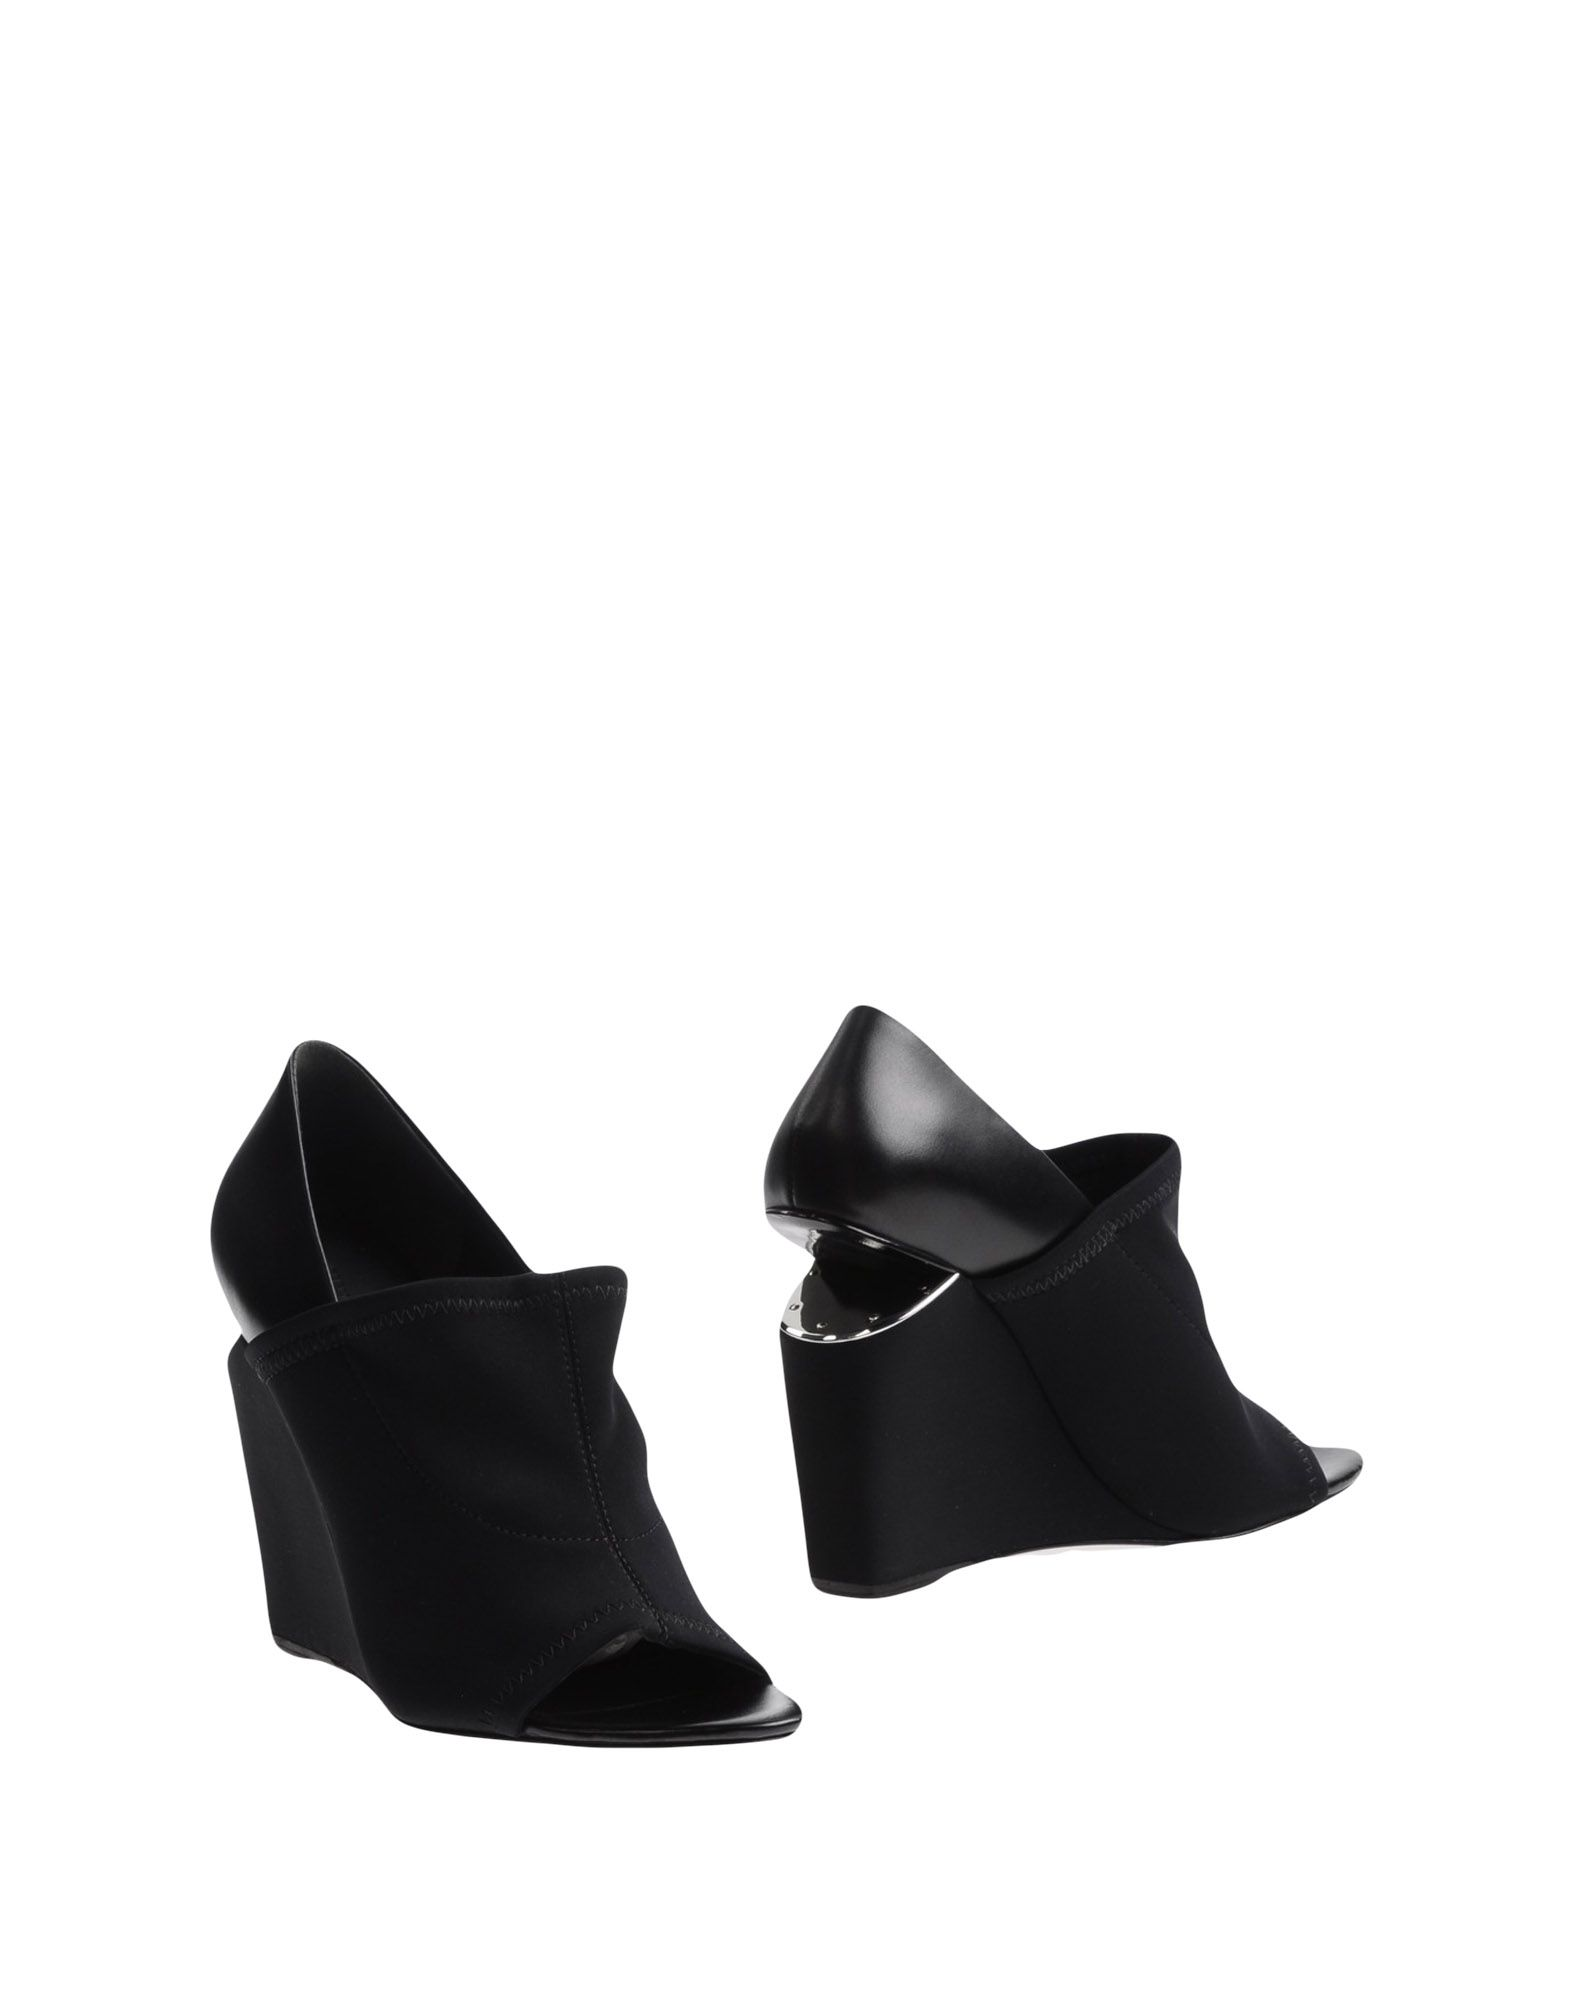 Alexander Wang Stiefelette Damen  11301855WFGut aussehende strapazierfähige Schuhe